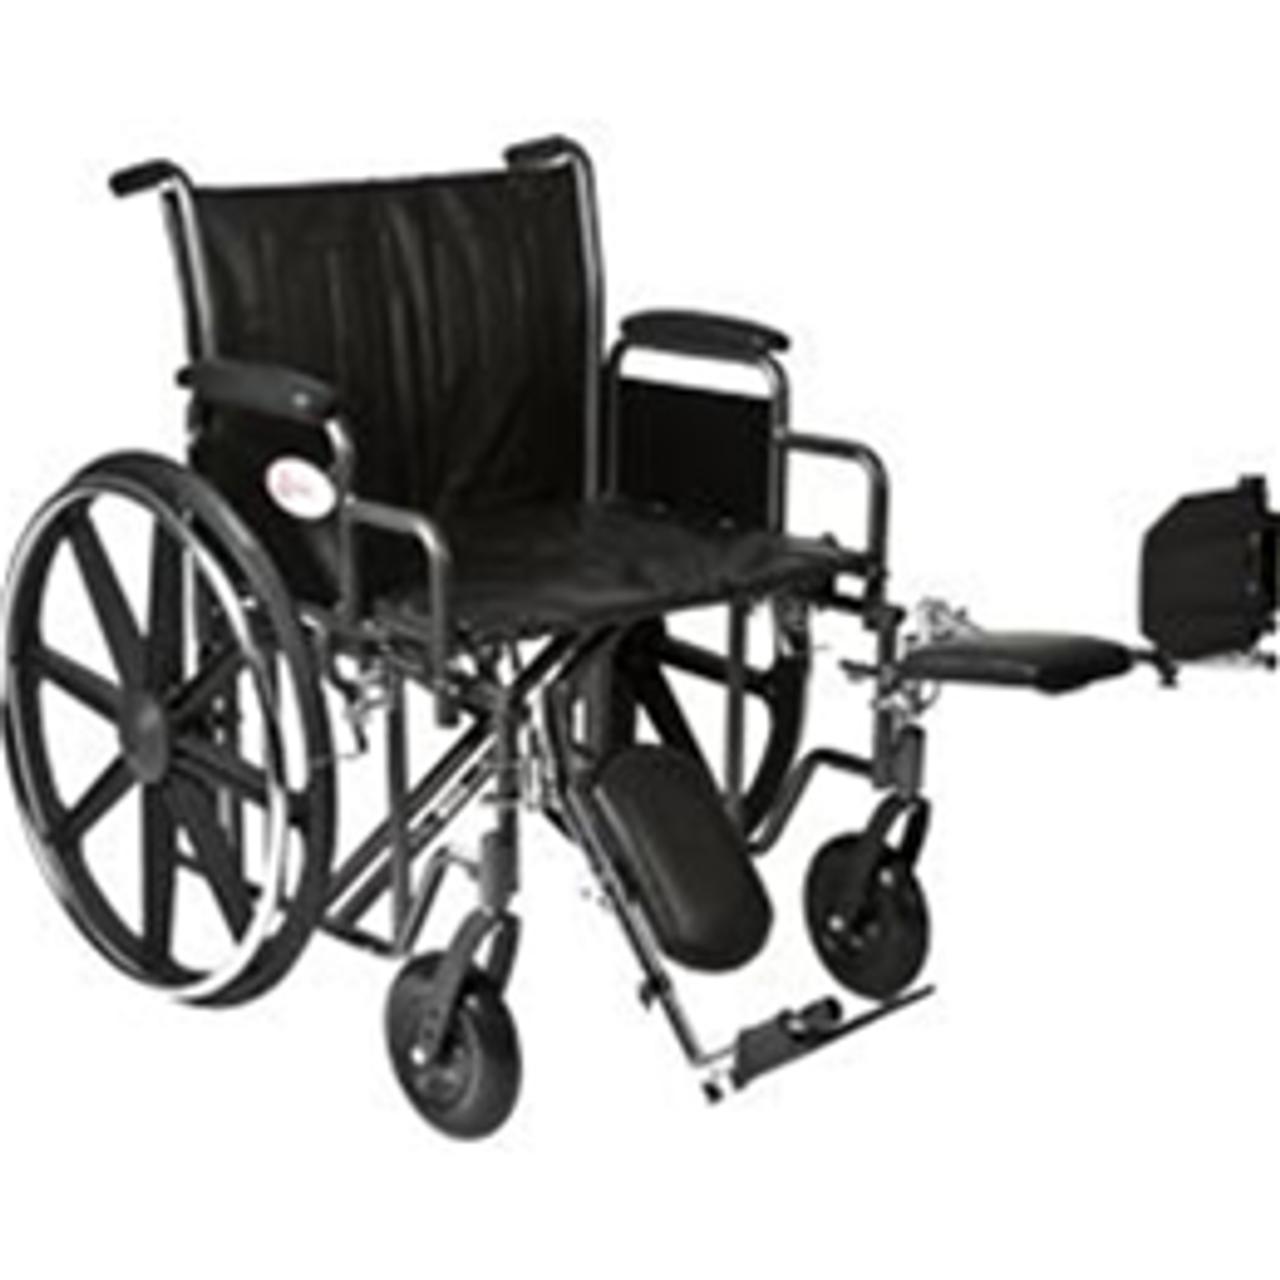 Roscoe K7 Wheelchair